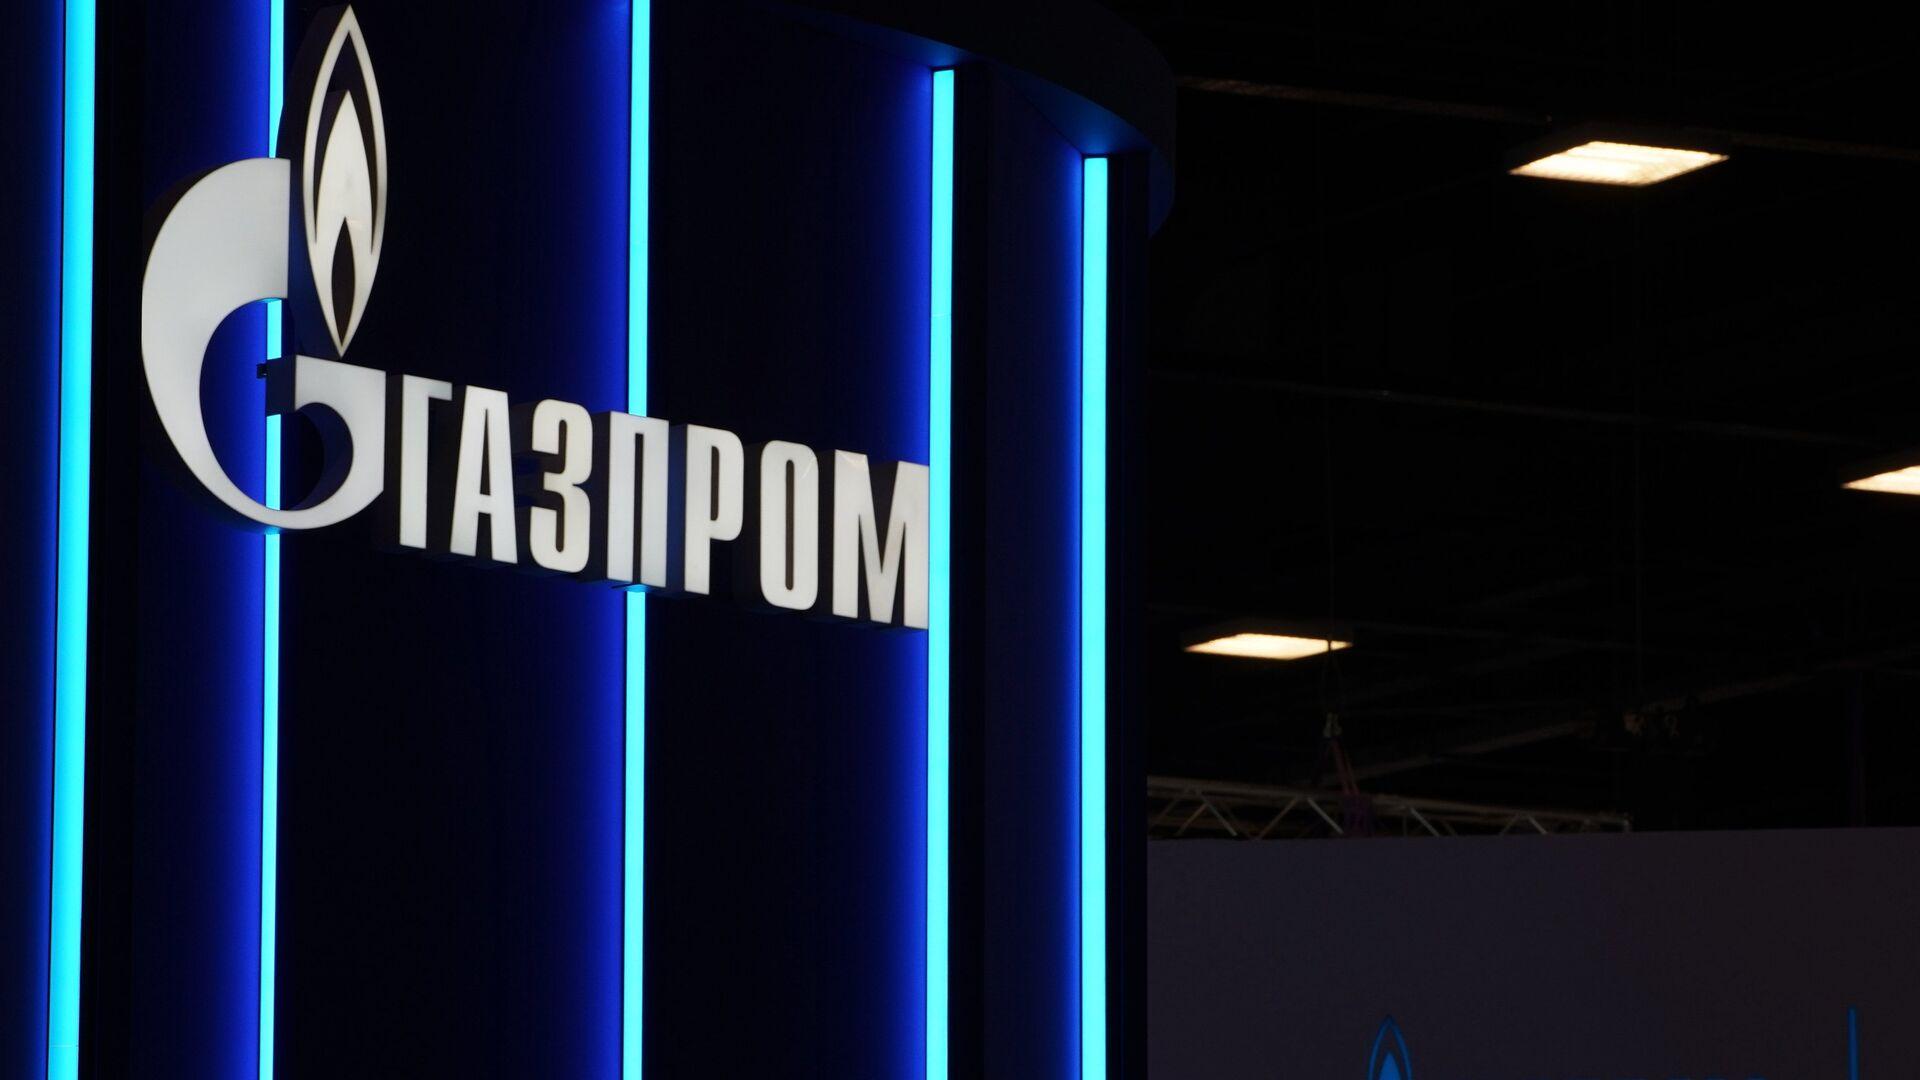 Logo de Gazprom - Sputnik Mundo, 1920, 24.09.2021